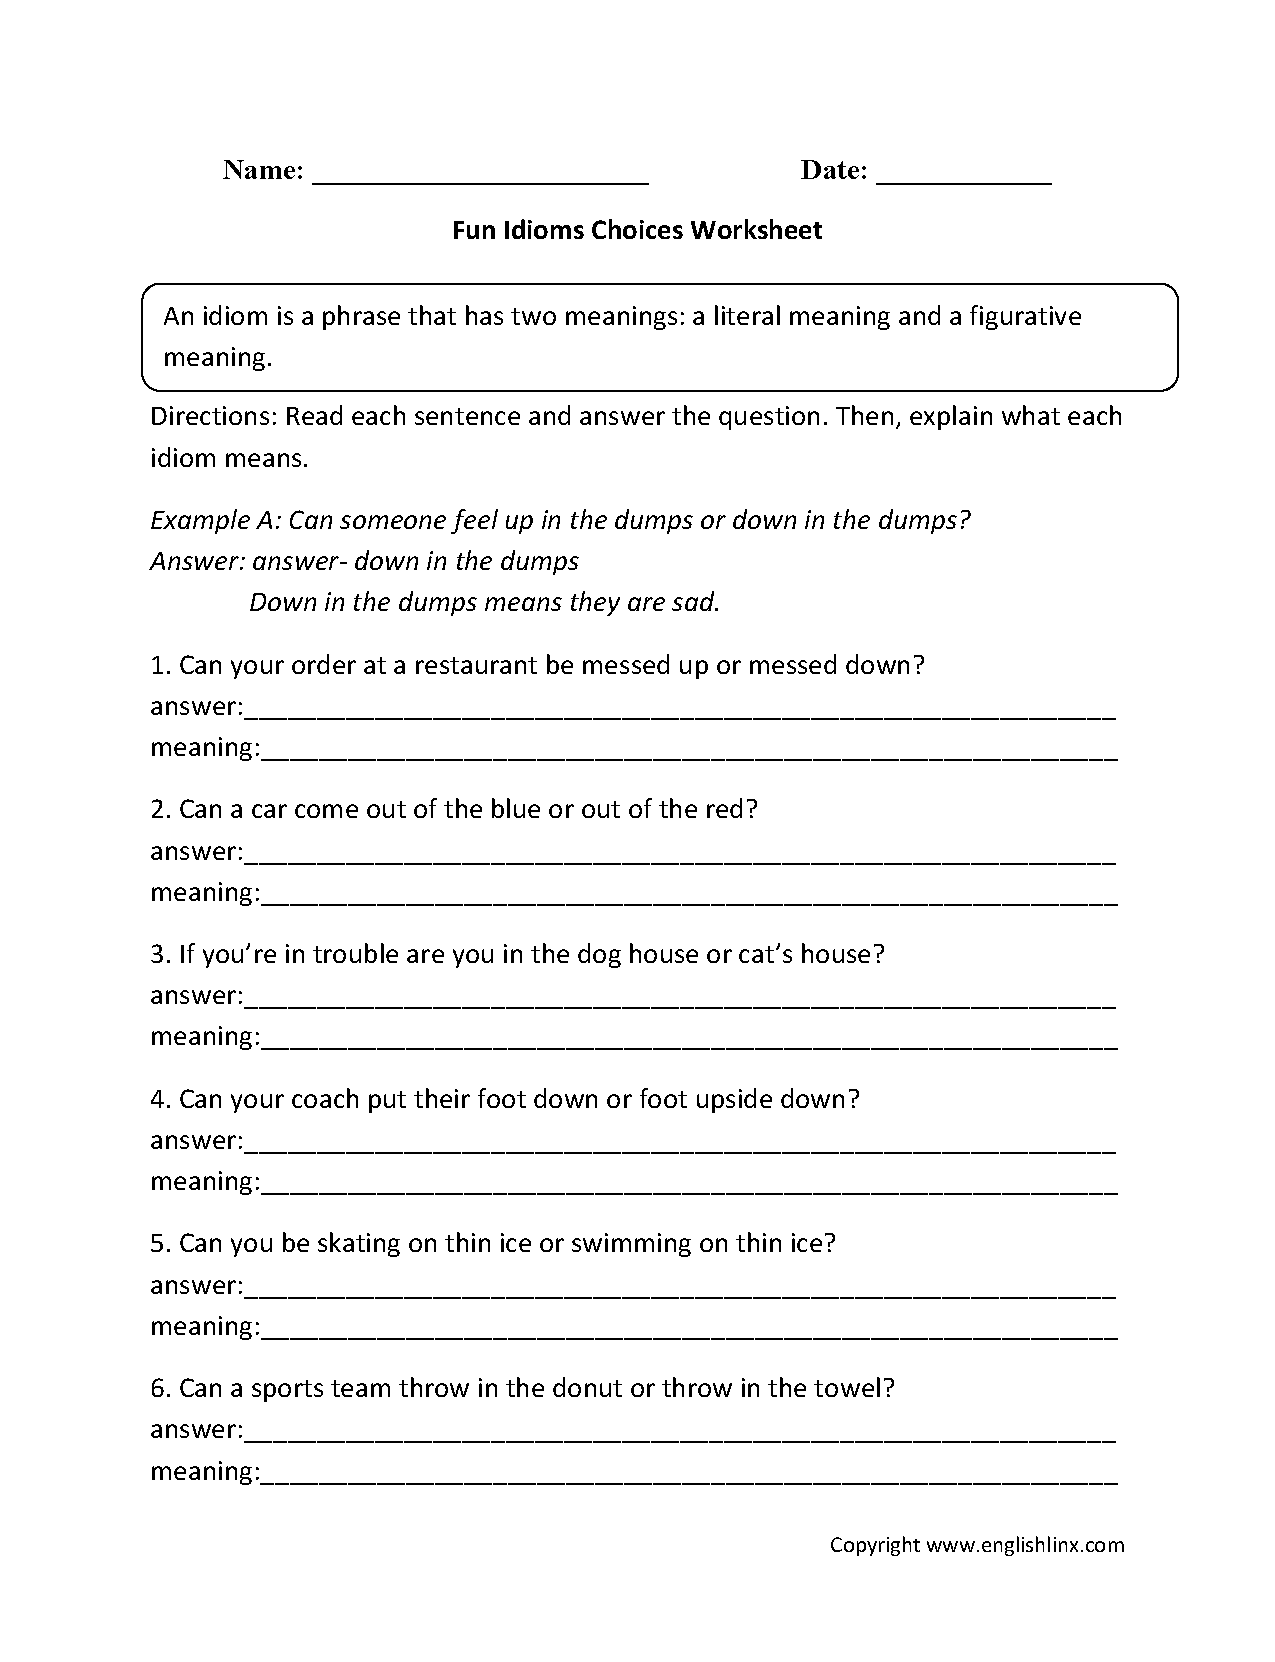 Fun Idioms Choices Worksheets